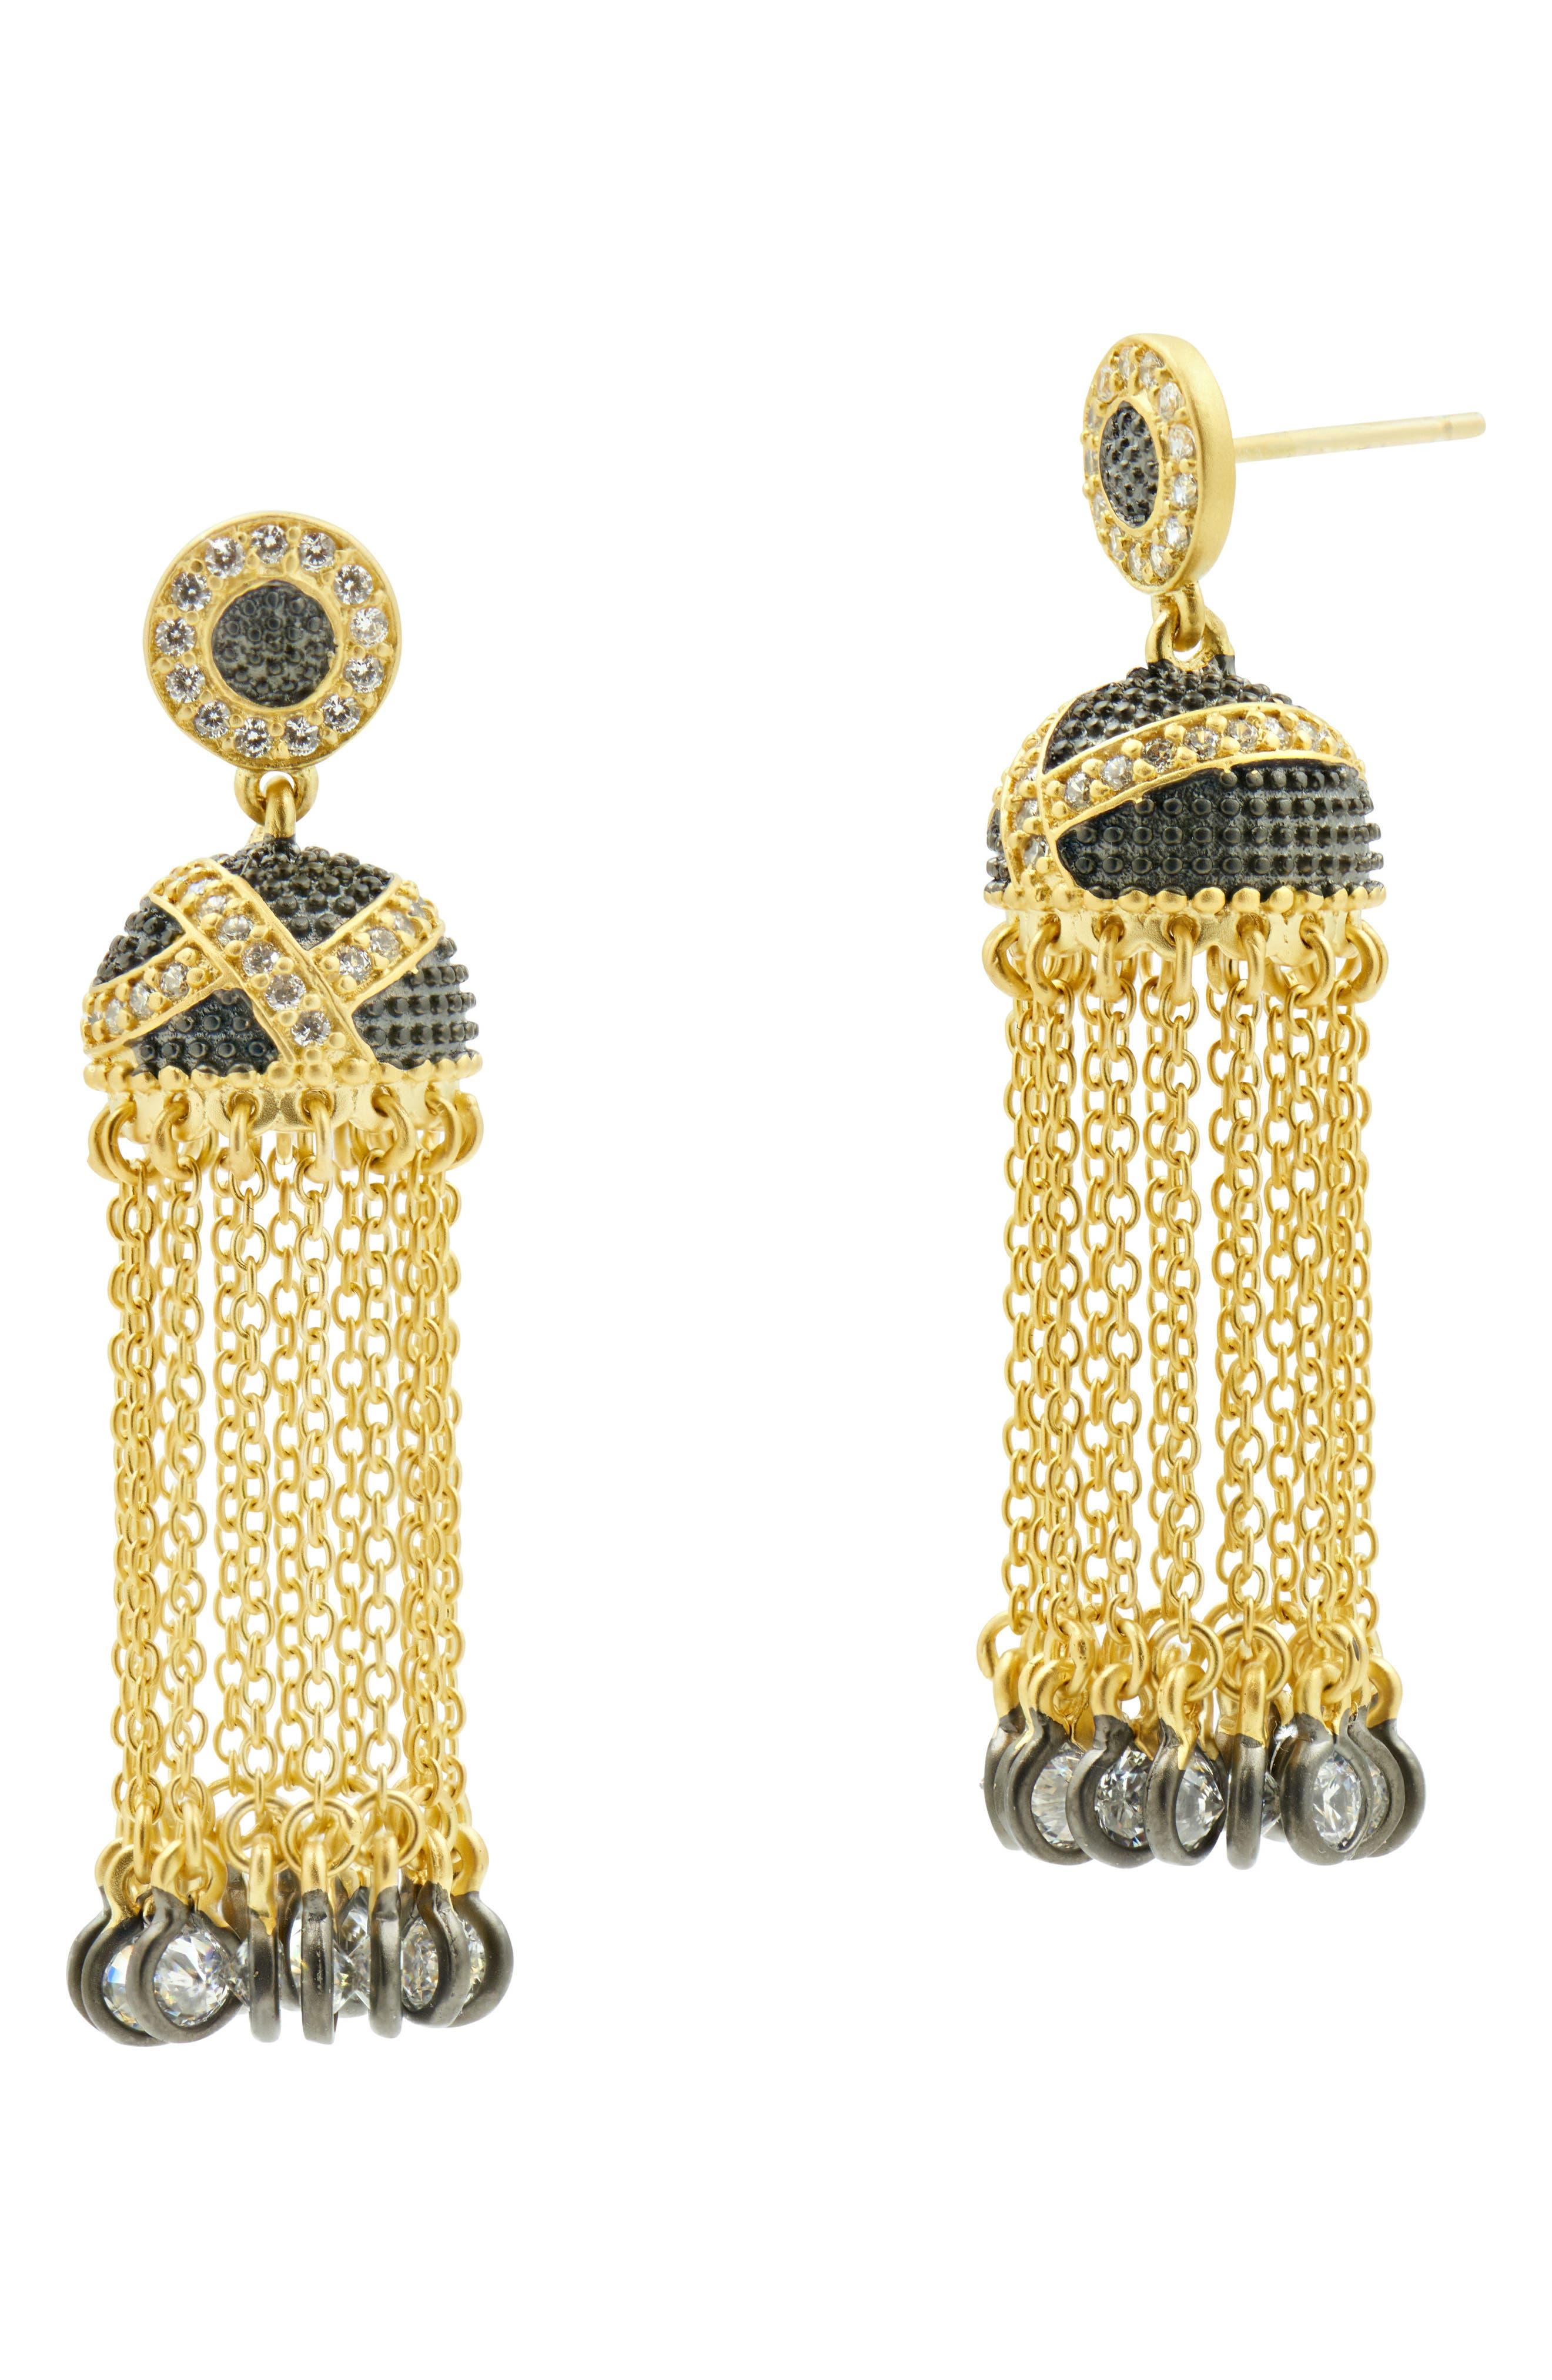 Alternate Image 1 Selected - FREIDA ROTHMAN Textured Ornaments Tassel Drop Earrings